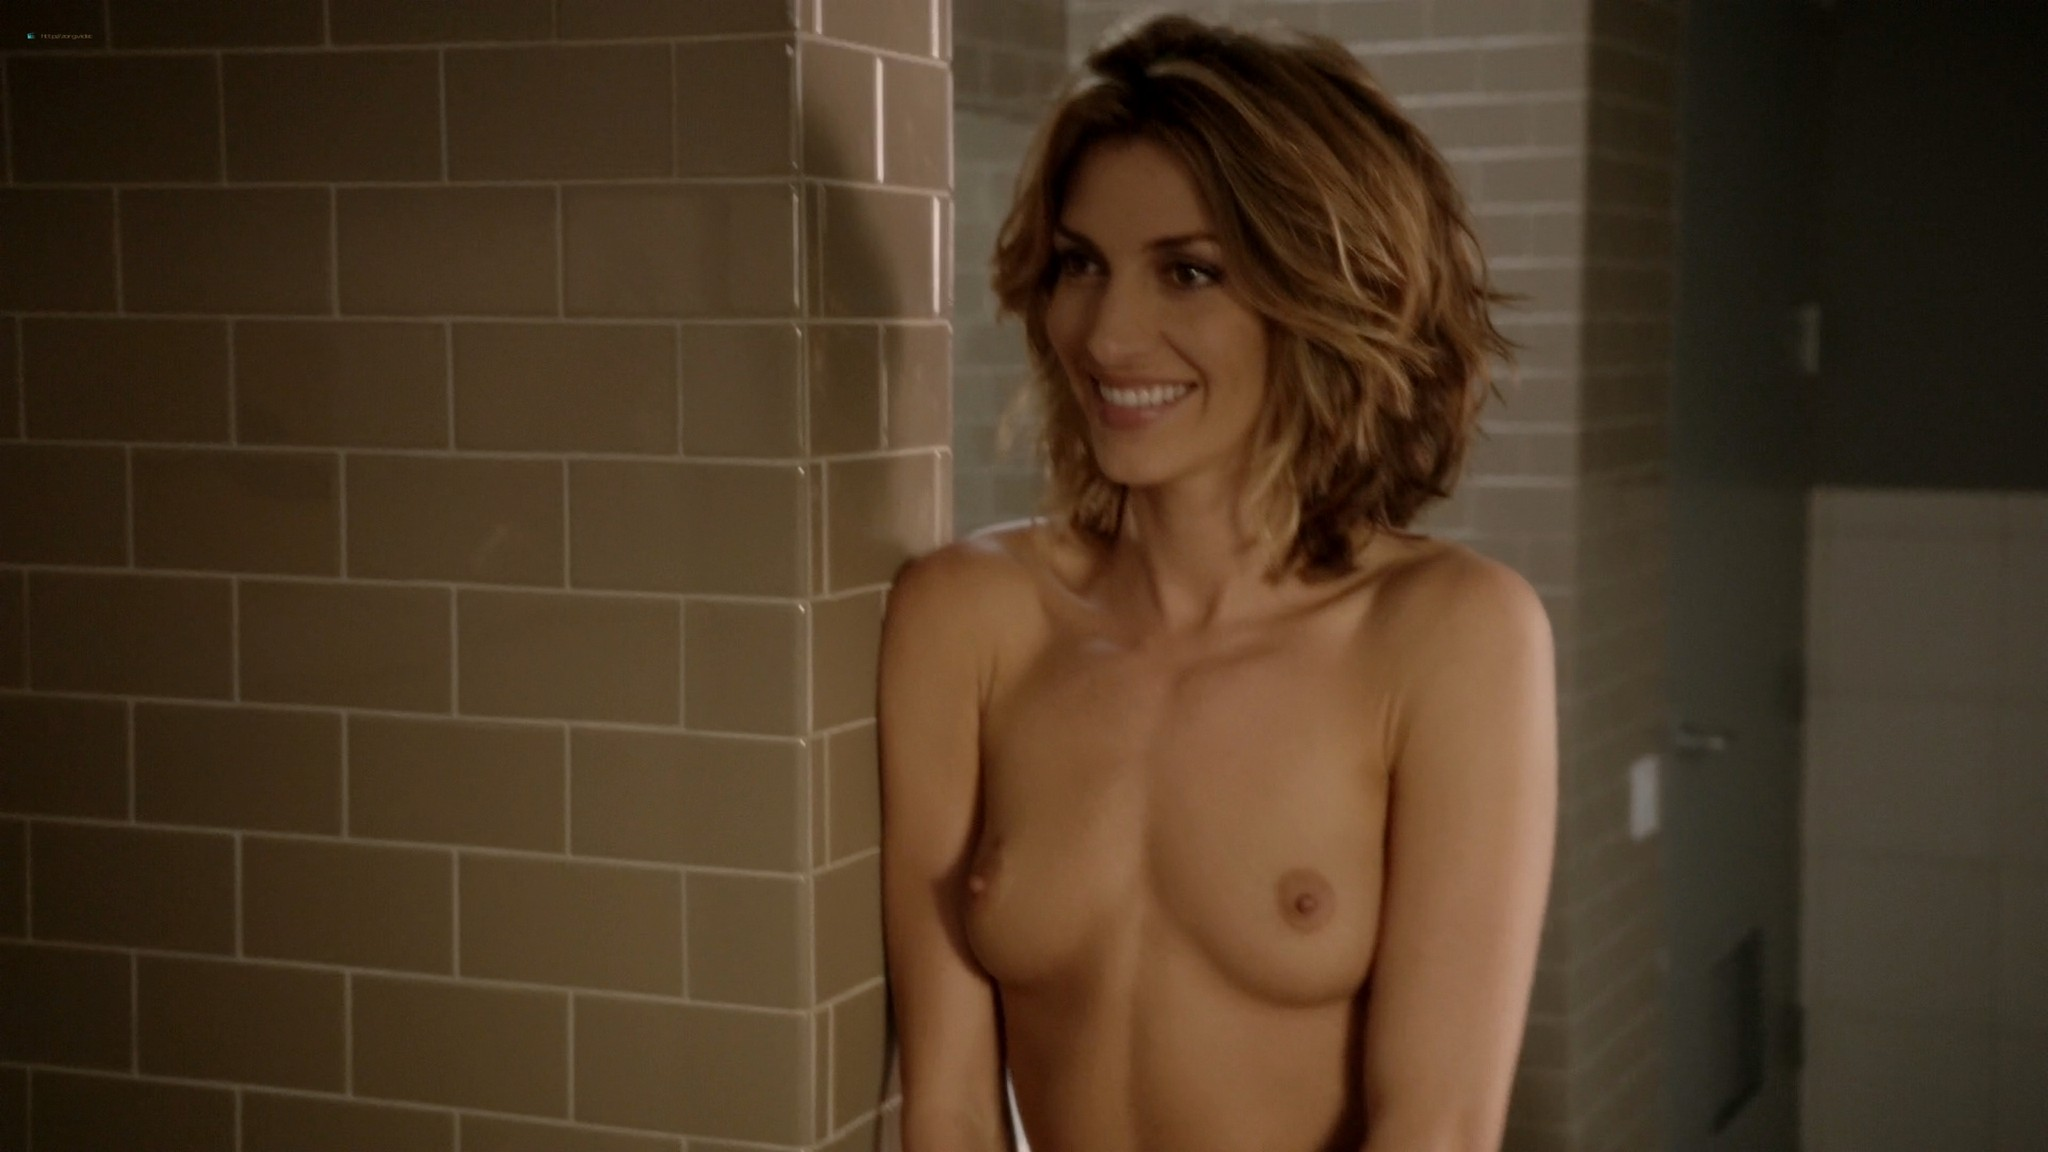 Megalyn Echikunwoke nude topless and Dawn Olivieri nude too House of Lies 2012 s1e7 1080p Web 6